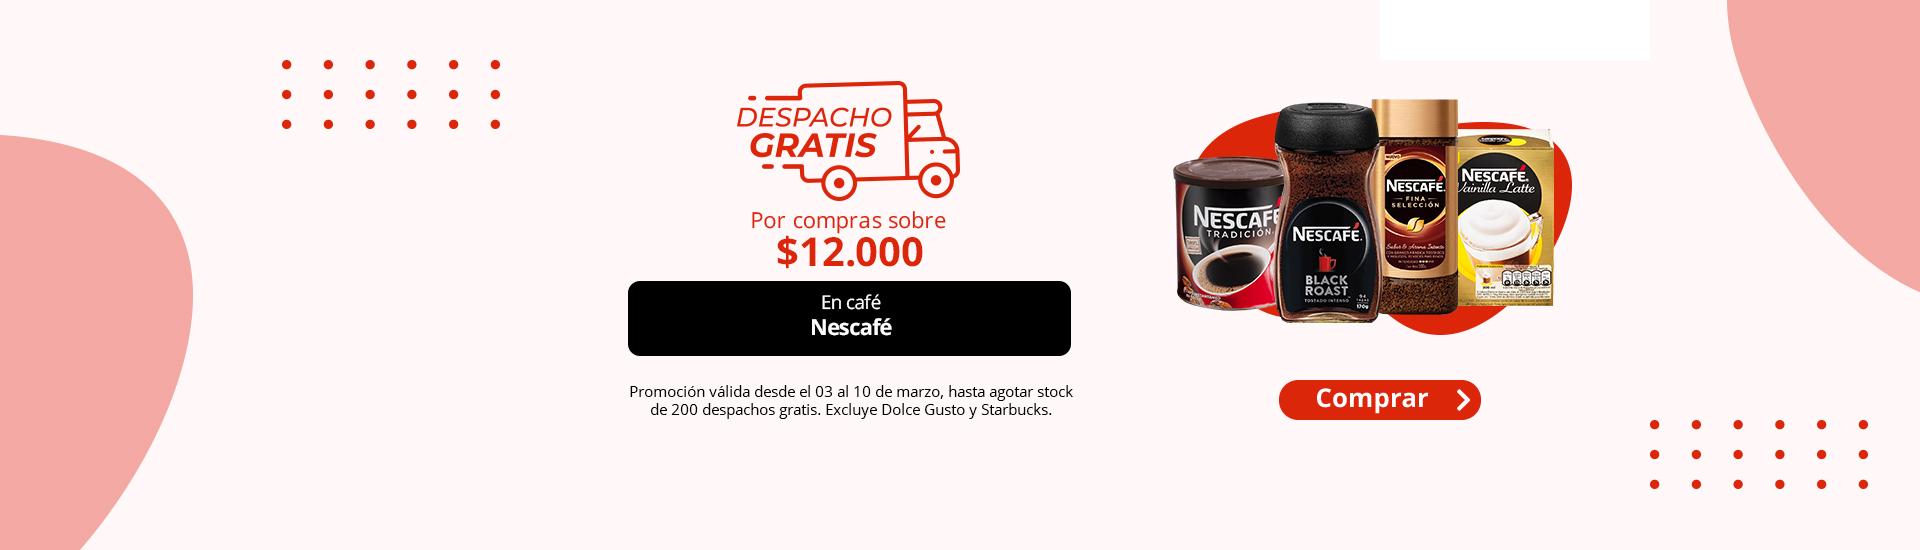 DG Nescafe